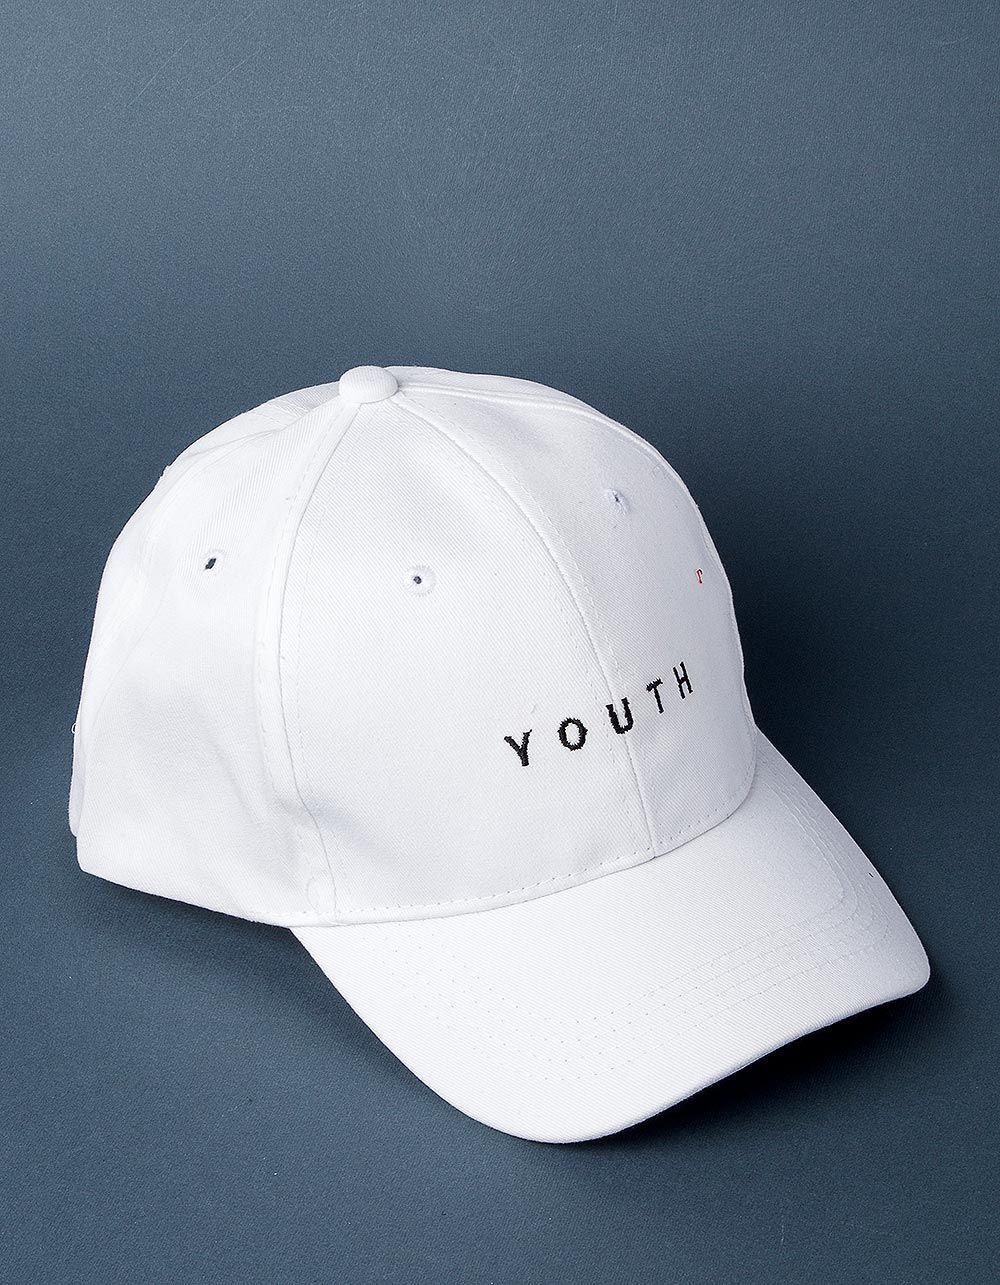 Бейсболка с надписью youth | 224020-01-XX